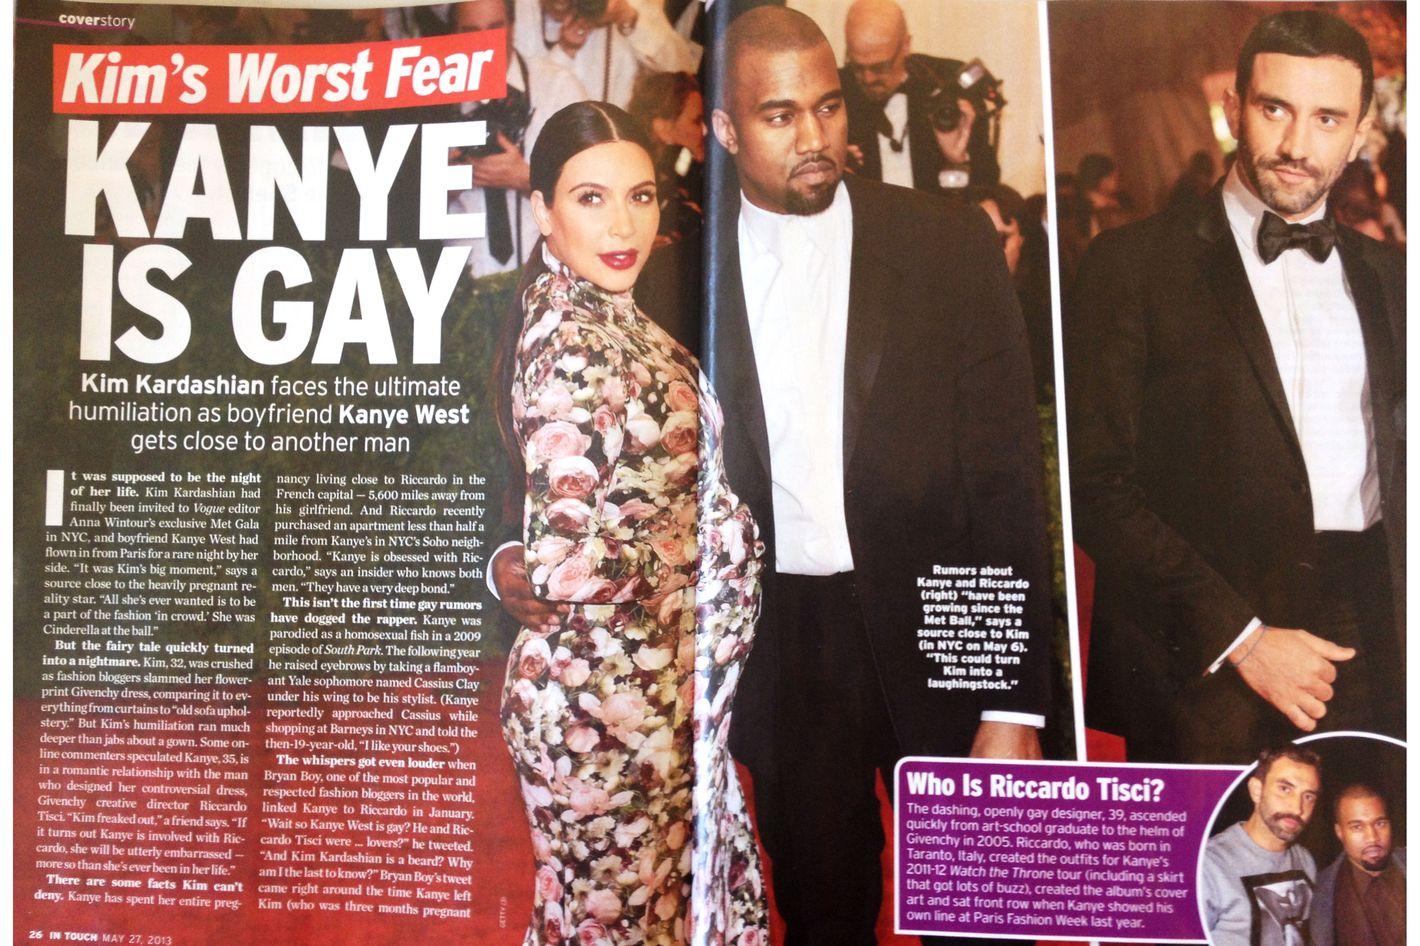 Kanye west gay rumors, Selena gomez sex pics